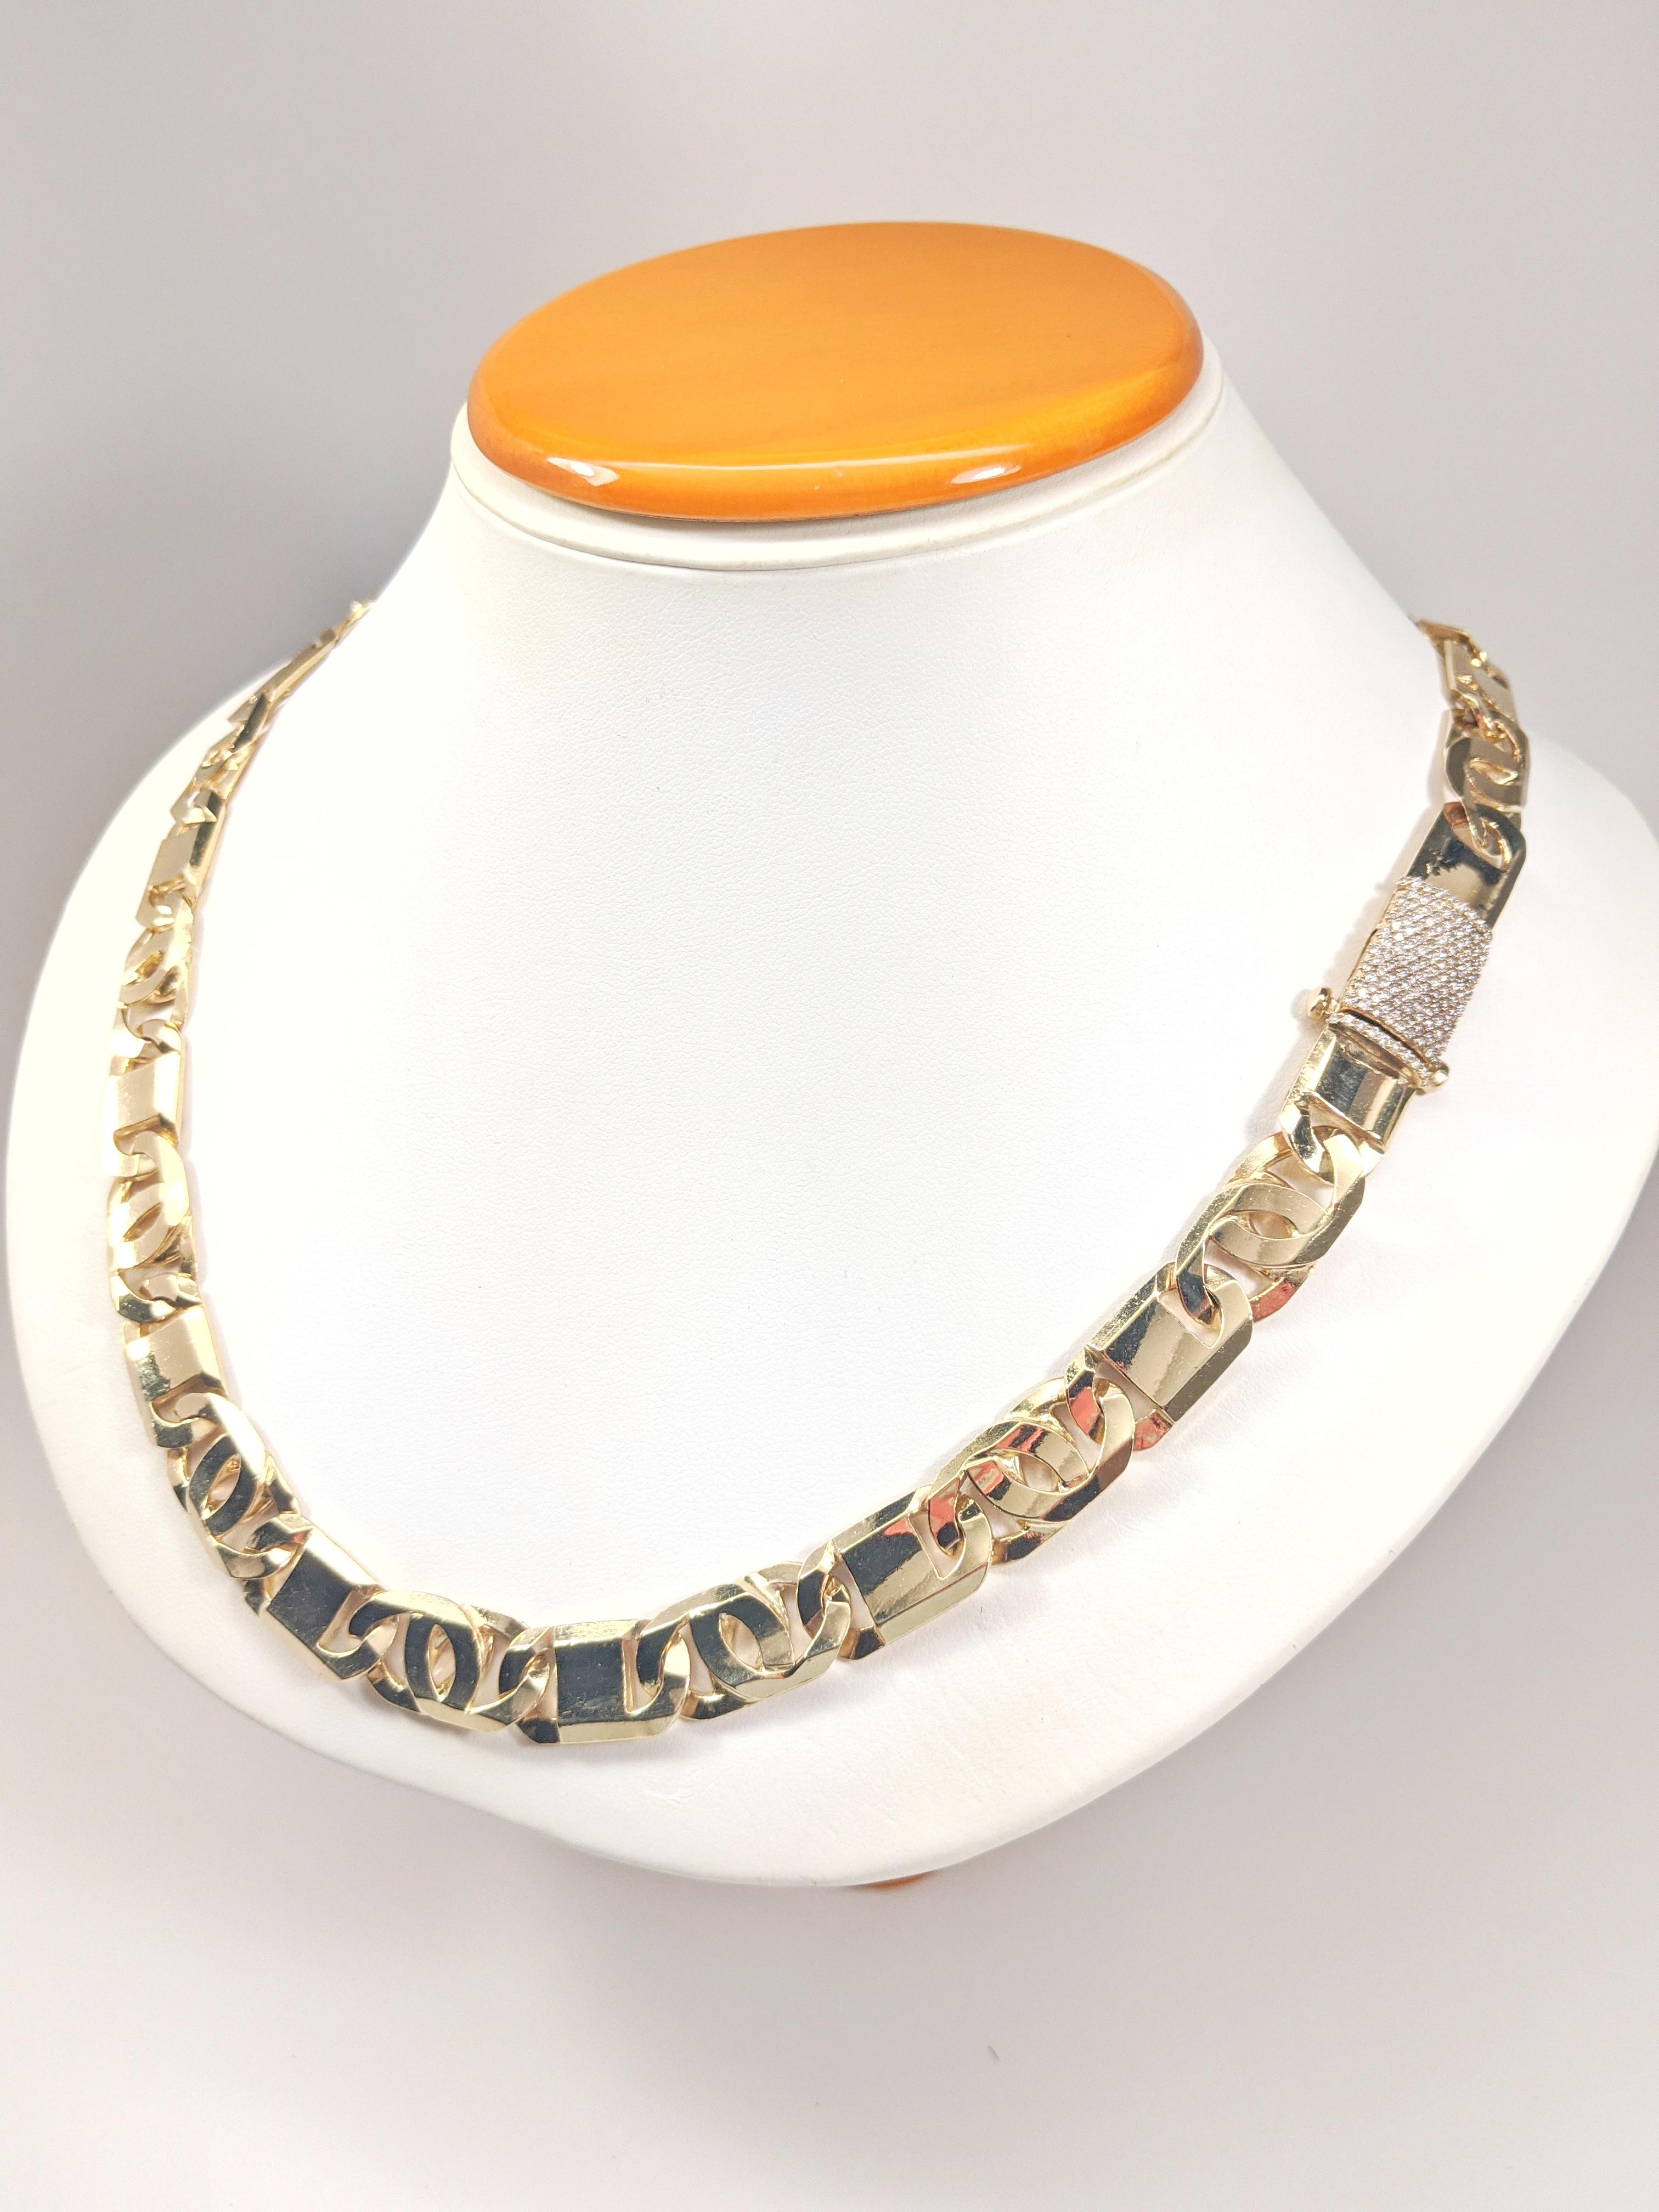 14KT Yellow Gold Solid Heavy Fancy Tiger Eye Link Chain, Hand Made Italian Chain 12MM wide, VVS Pave Diamond Lock, Cuban Box Lock 002